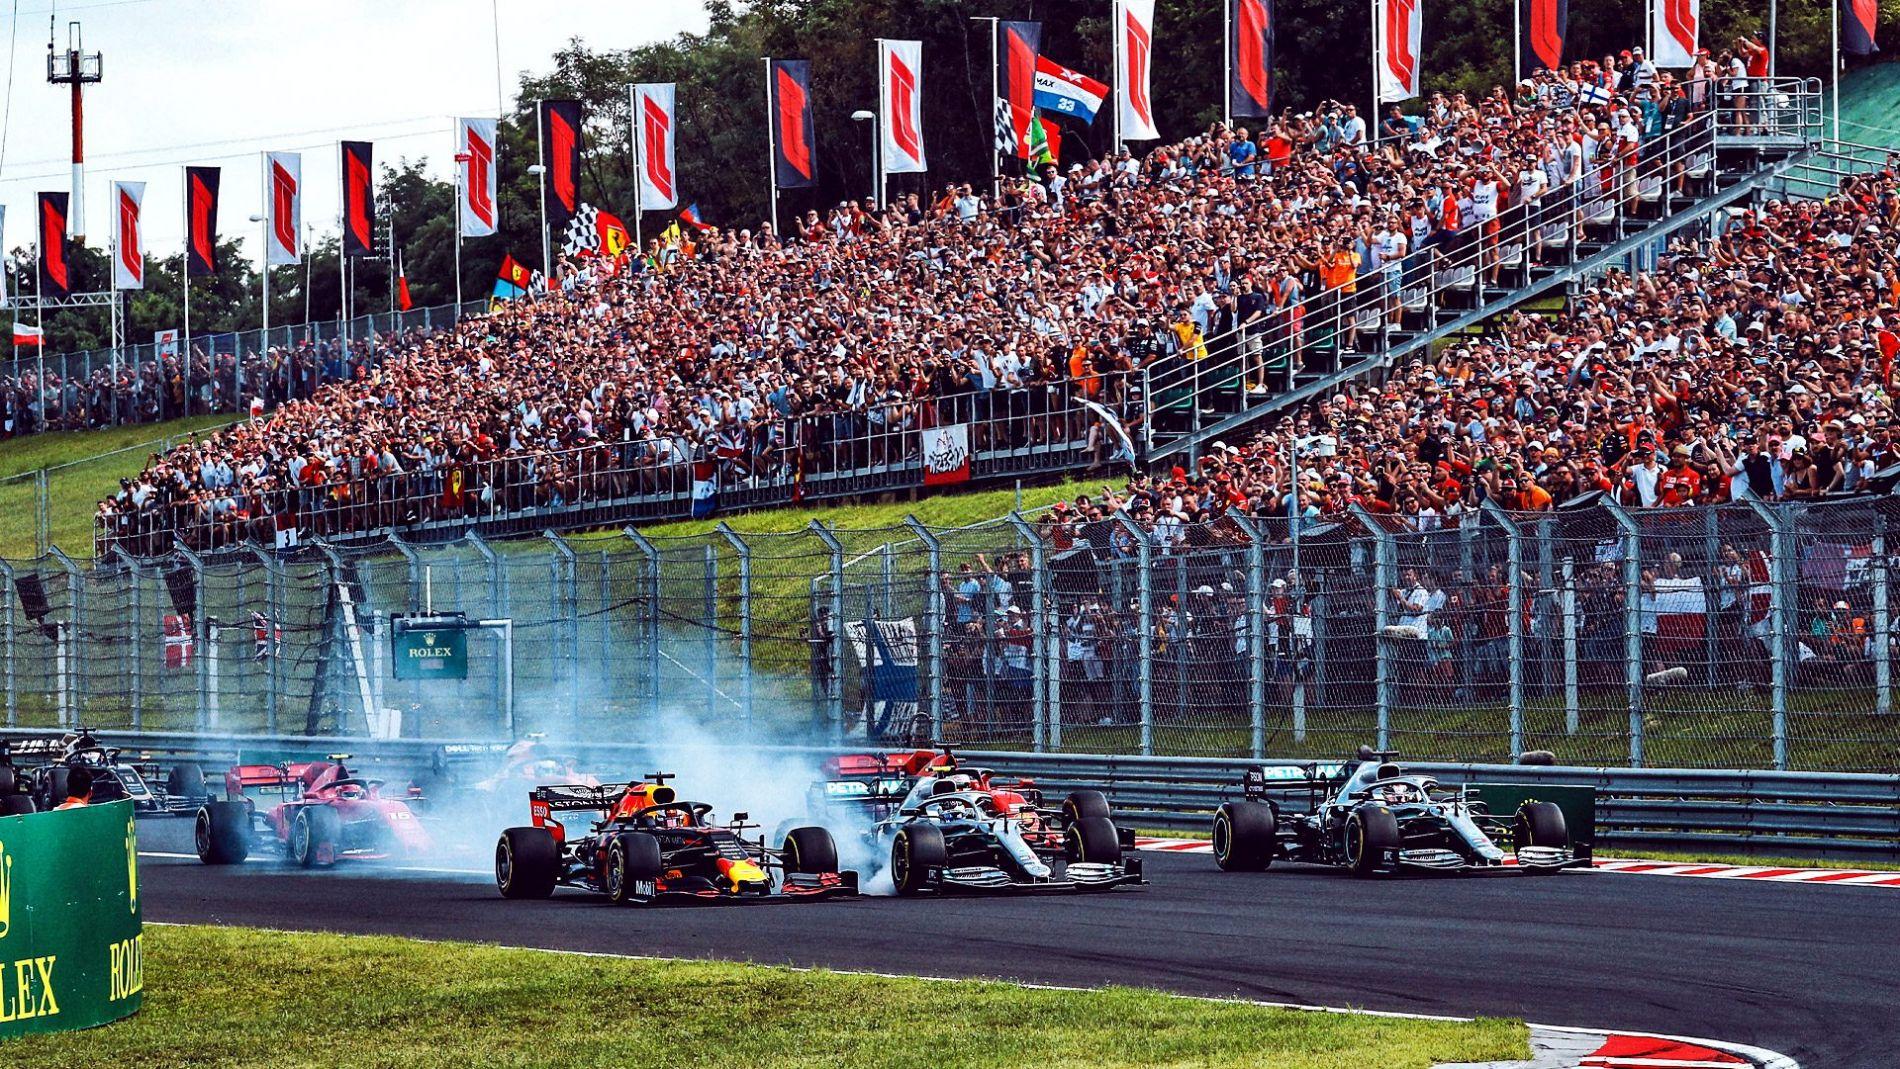 2020 Hungarian Grand Prix - 17-19 ივლისი